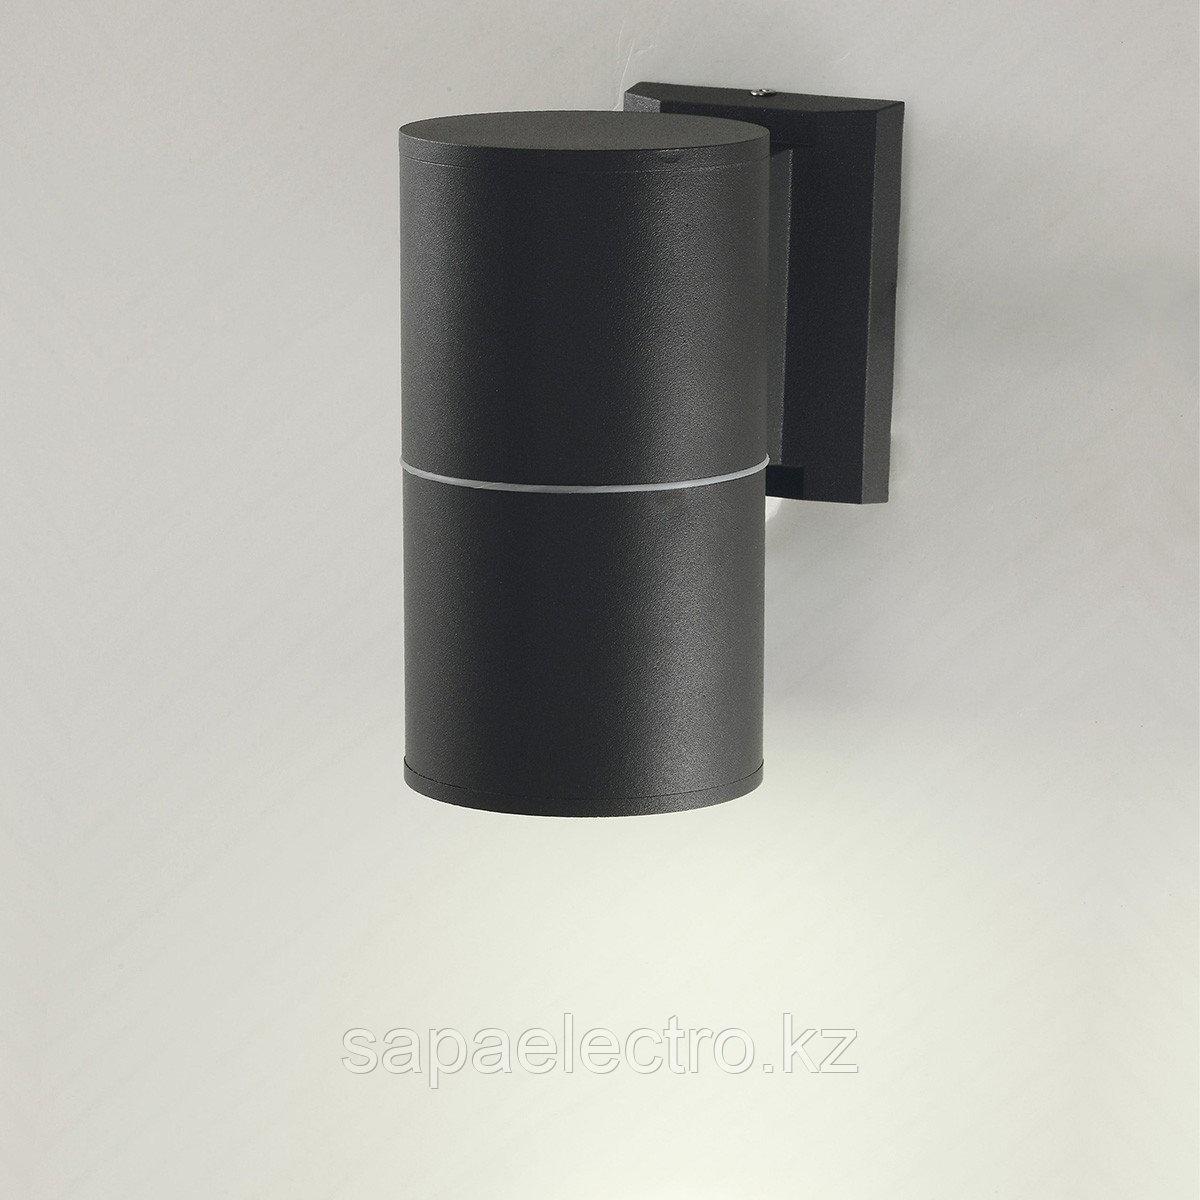 Свет-к LED B2151 10W Grey 5000K  (TS) 10шт